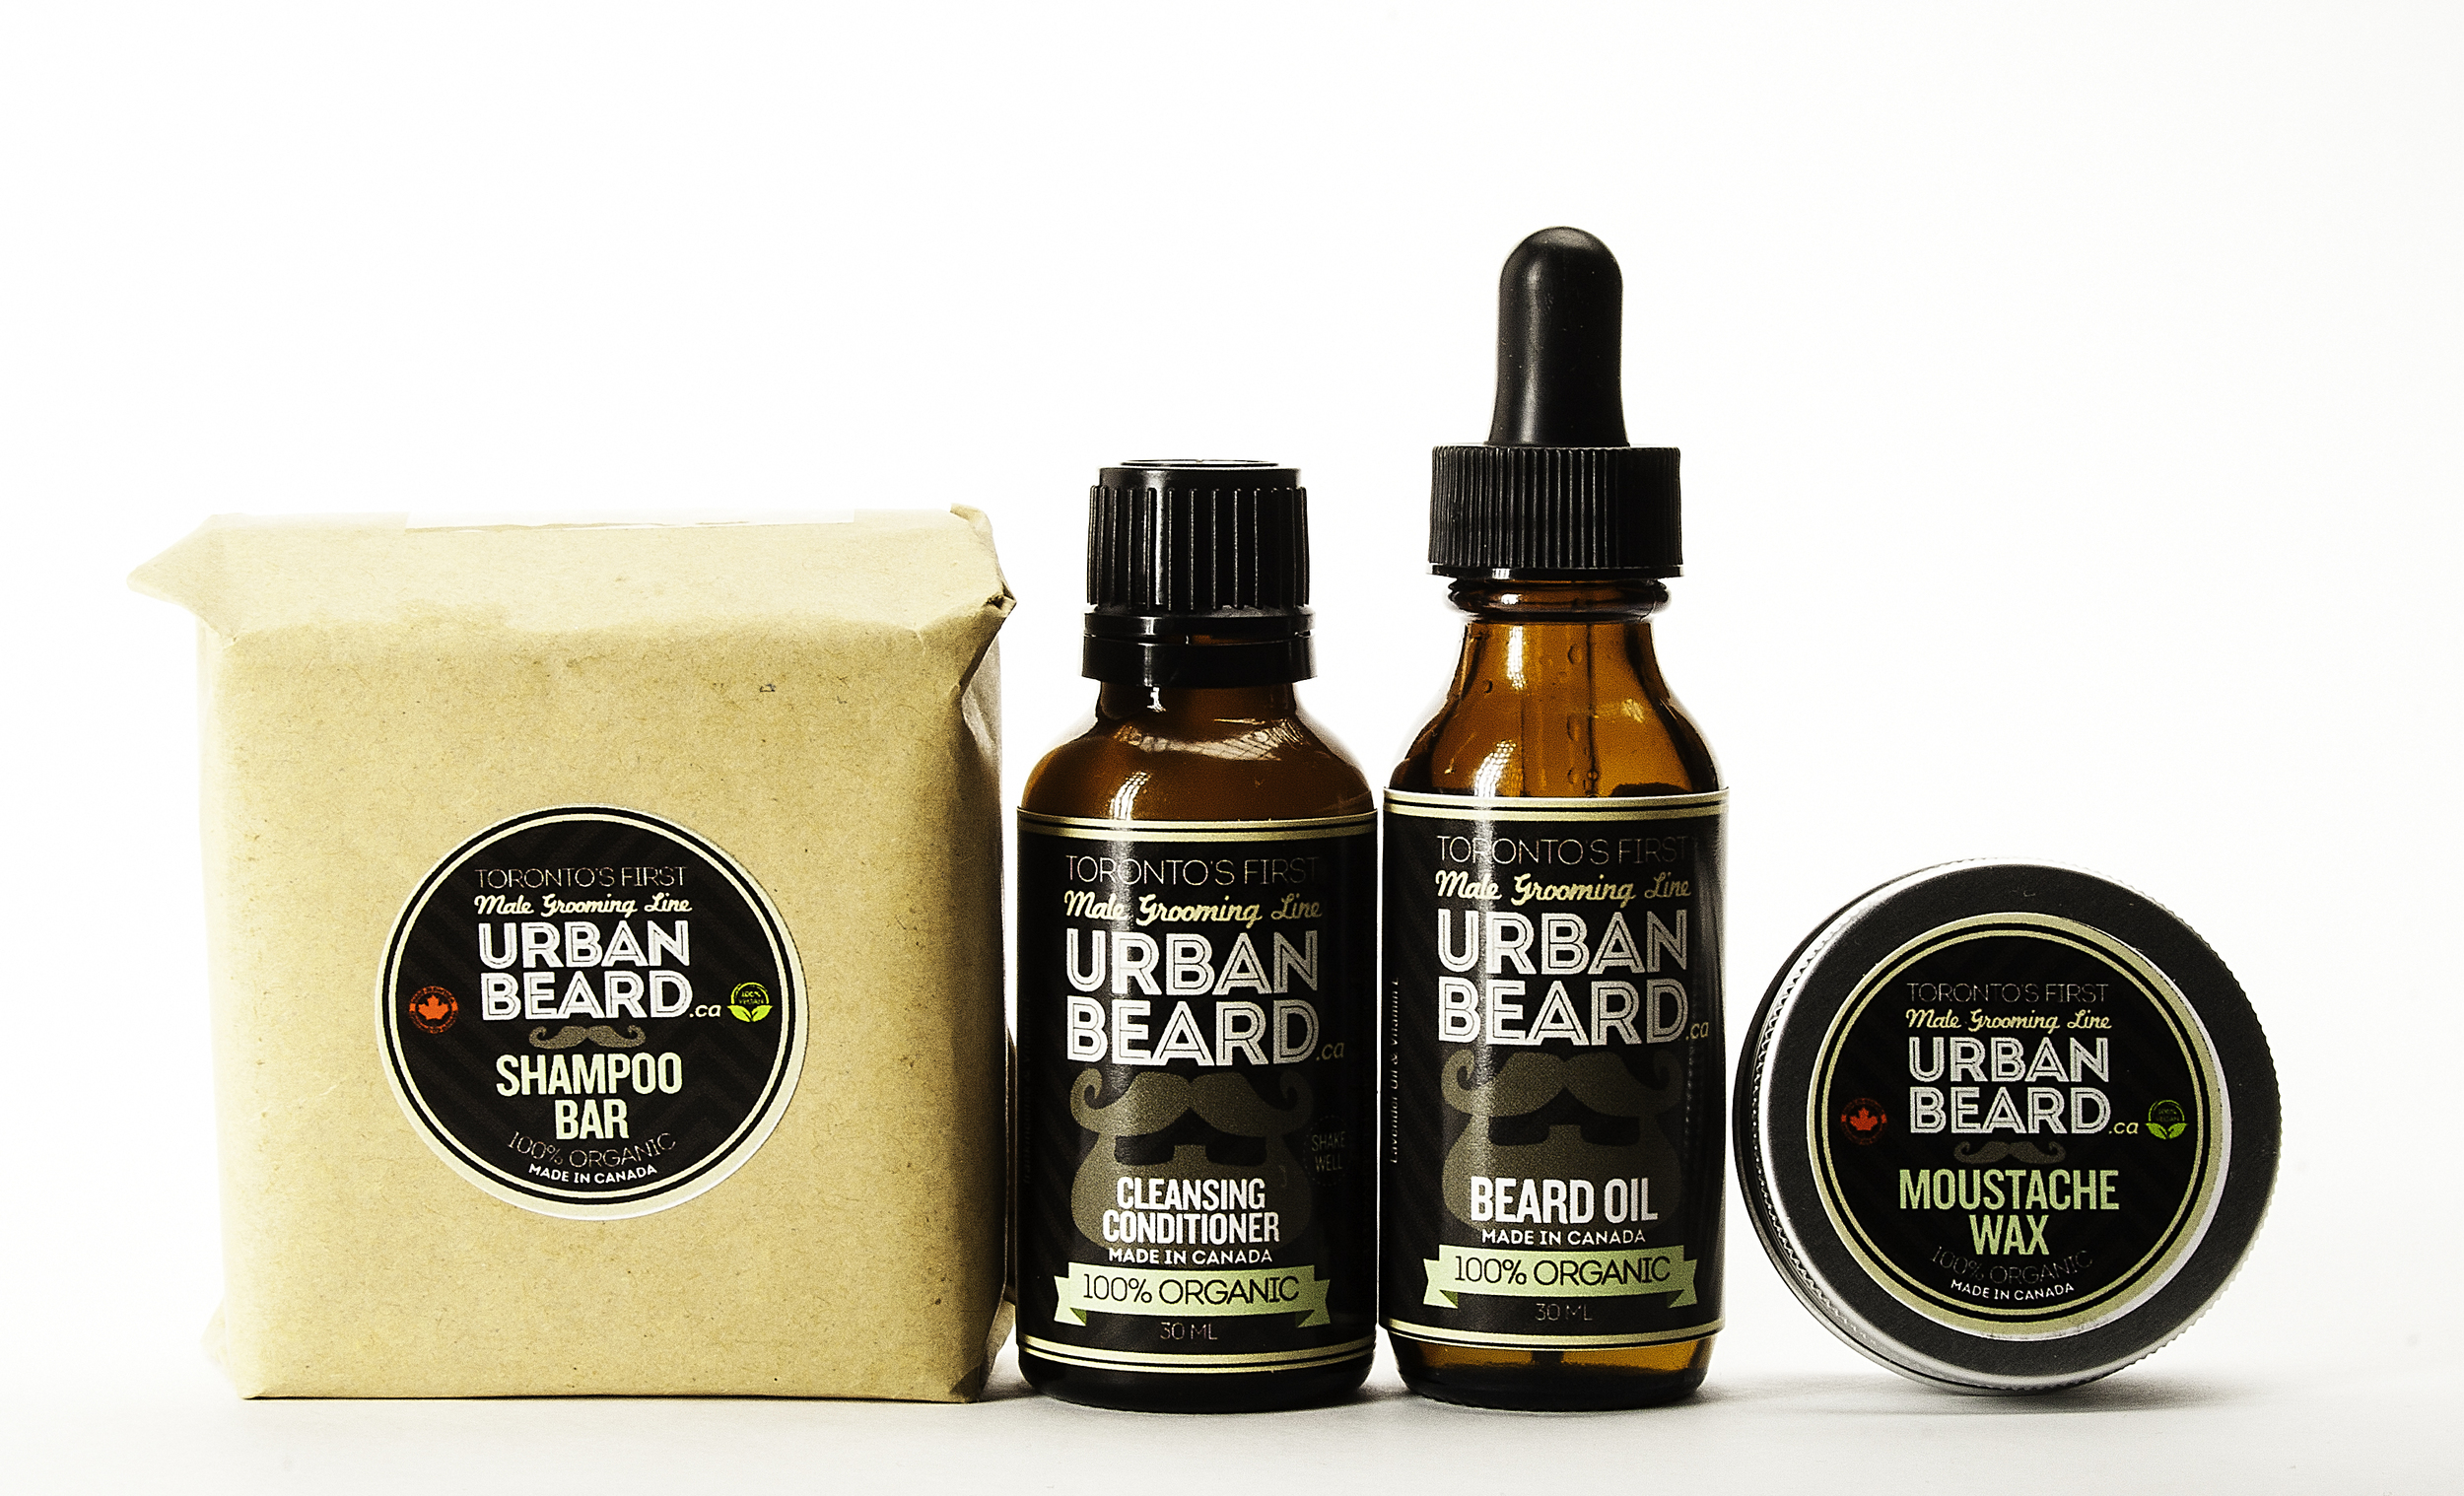 Shampoo Bar, Conditioner, Beard Oil, Moustache Wax